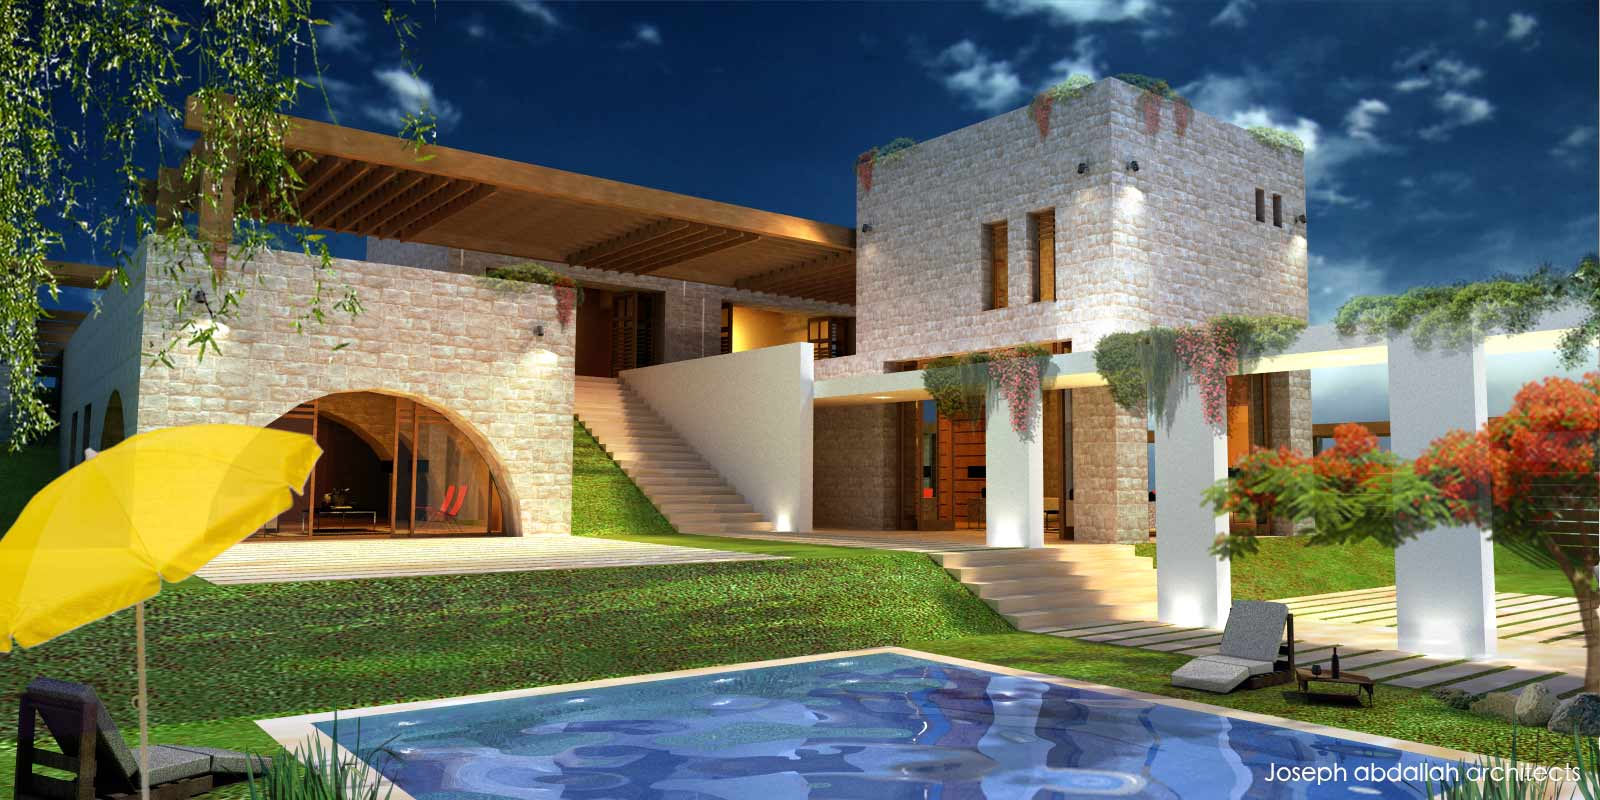 community-ajaltoun-villa-architecture-landscape-bnache-lebanon-joseph-abdallah-architects-3